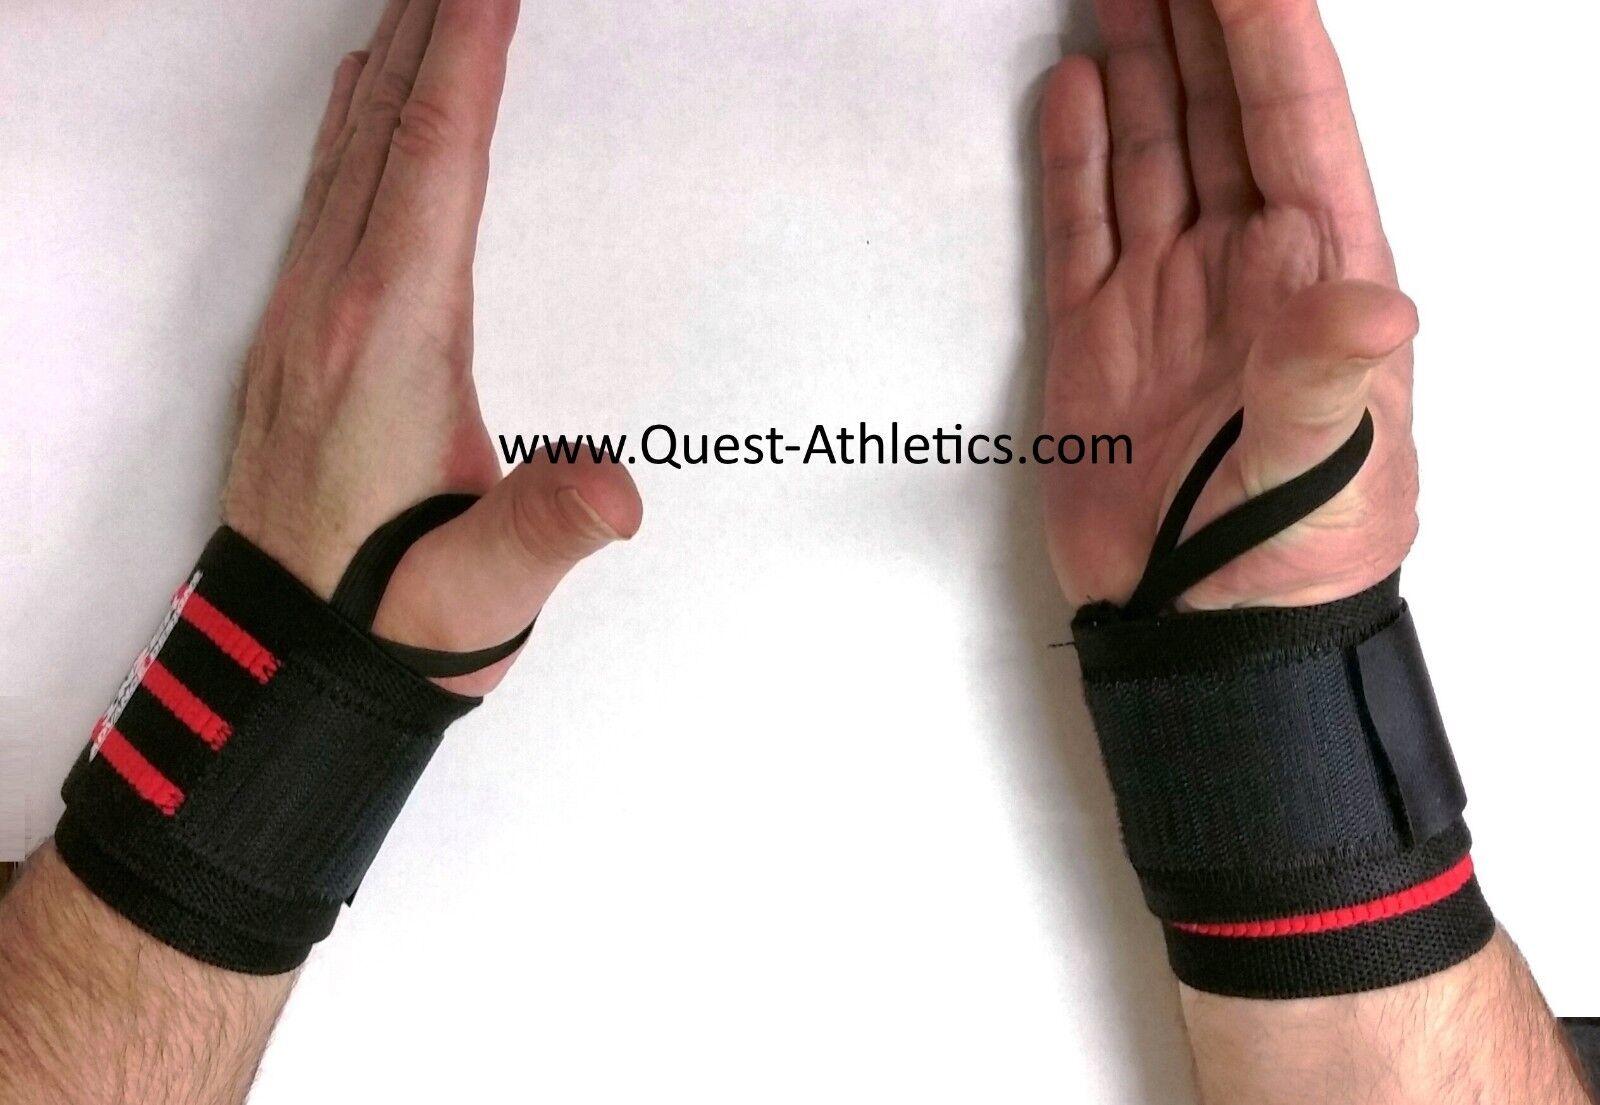 Inzer Iron Z Wrist Wraps 20 - Medium - Powerlifting Weightlifting CrossFit Strength Training Pair